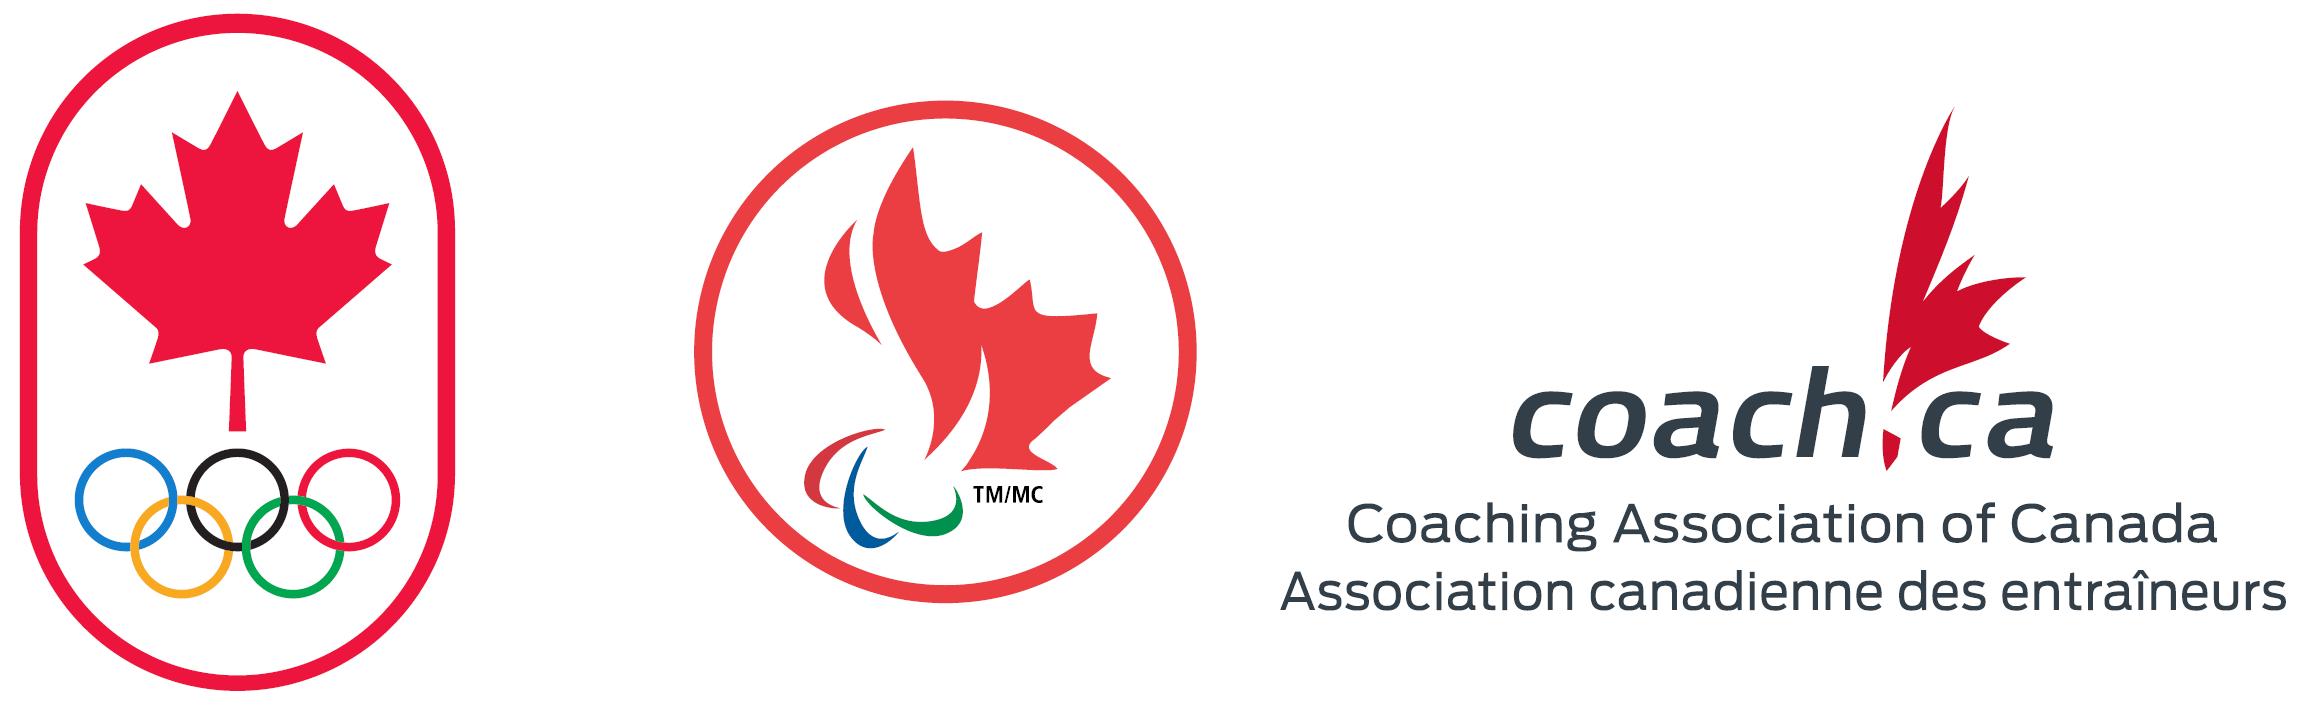 Olympic partners logo